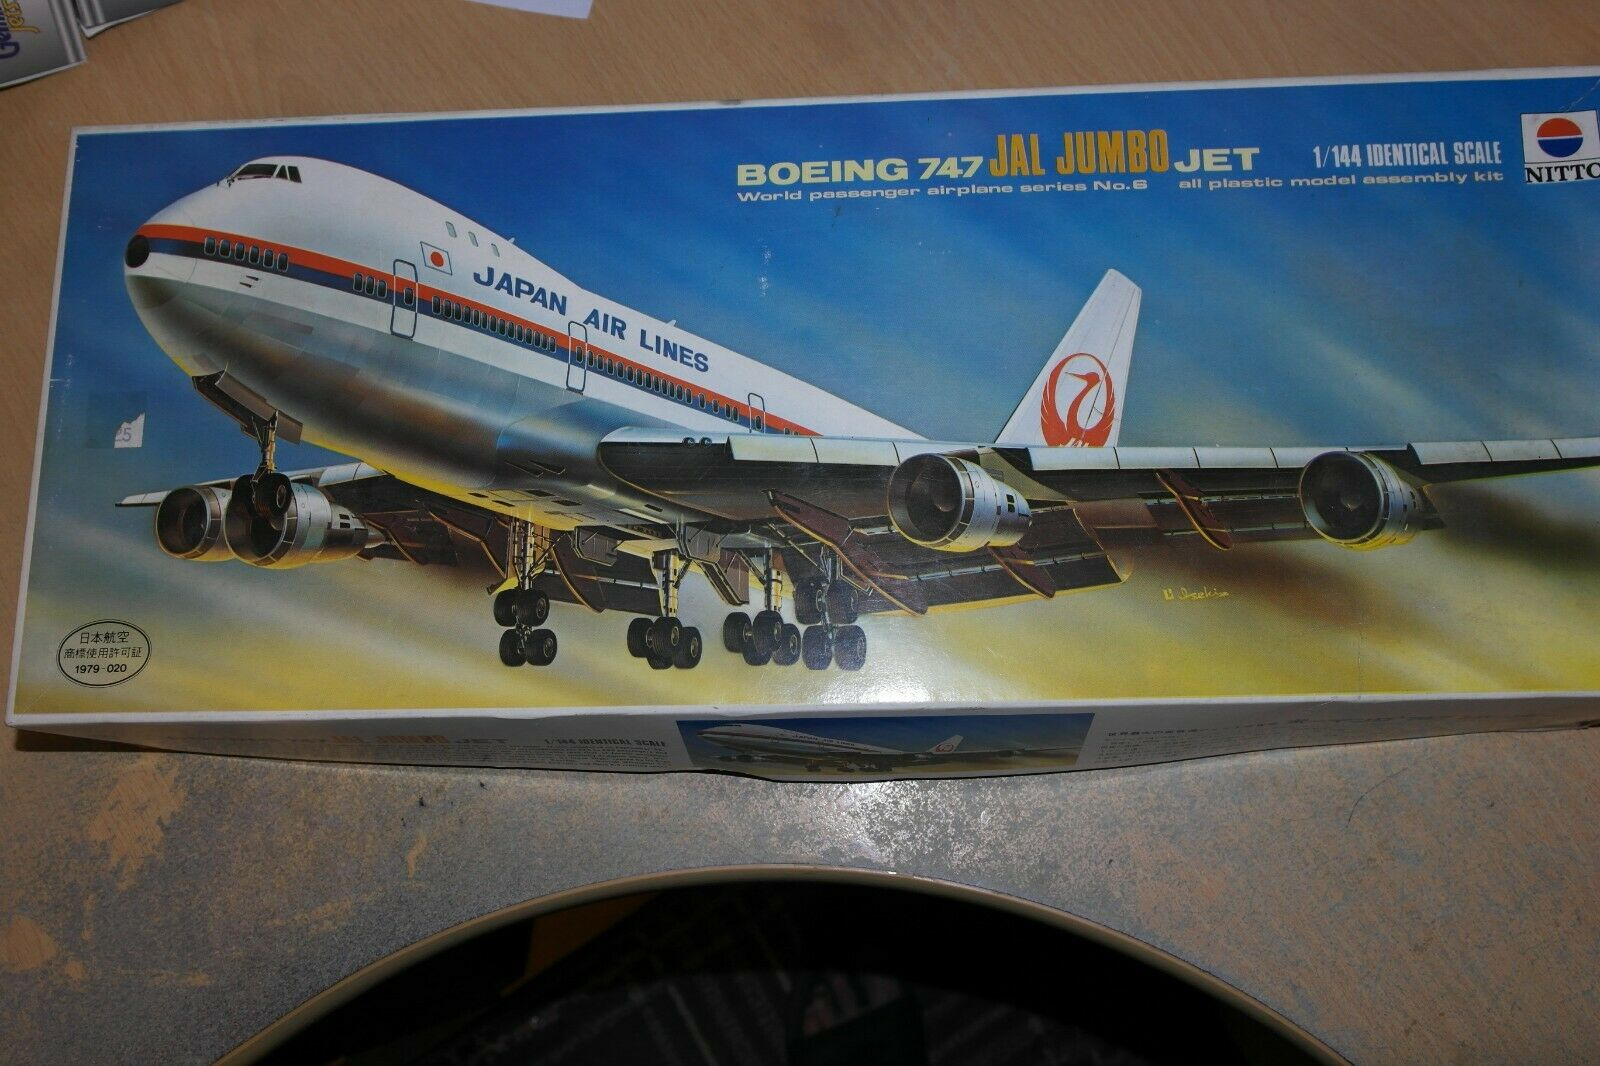 NITTO 1 144 BOEING 747 JAL JUMBO JET 159-1500